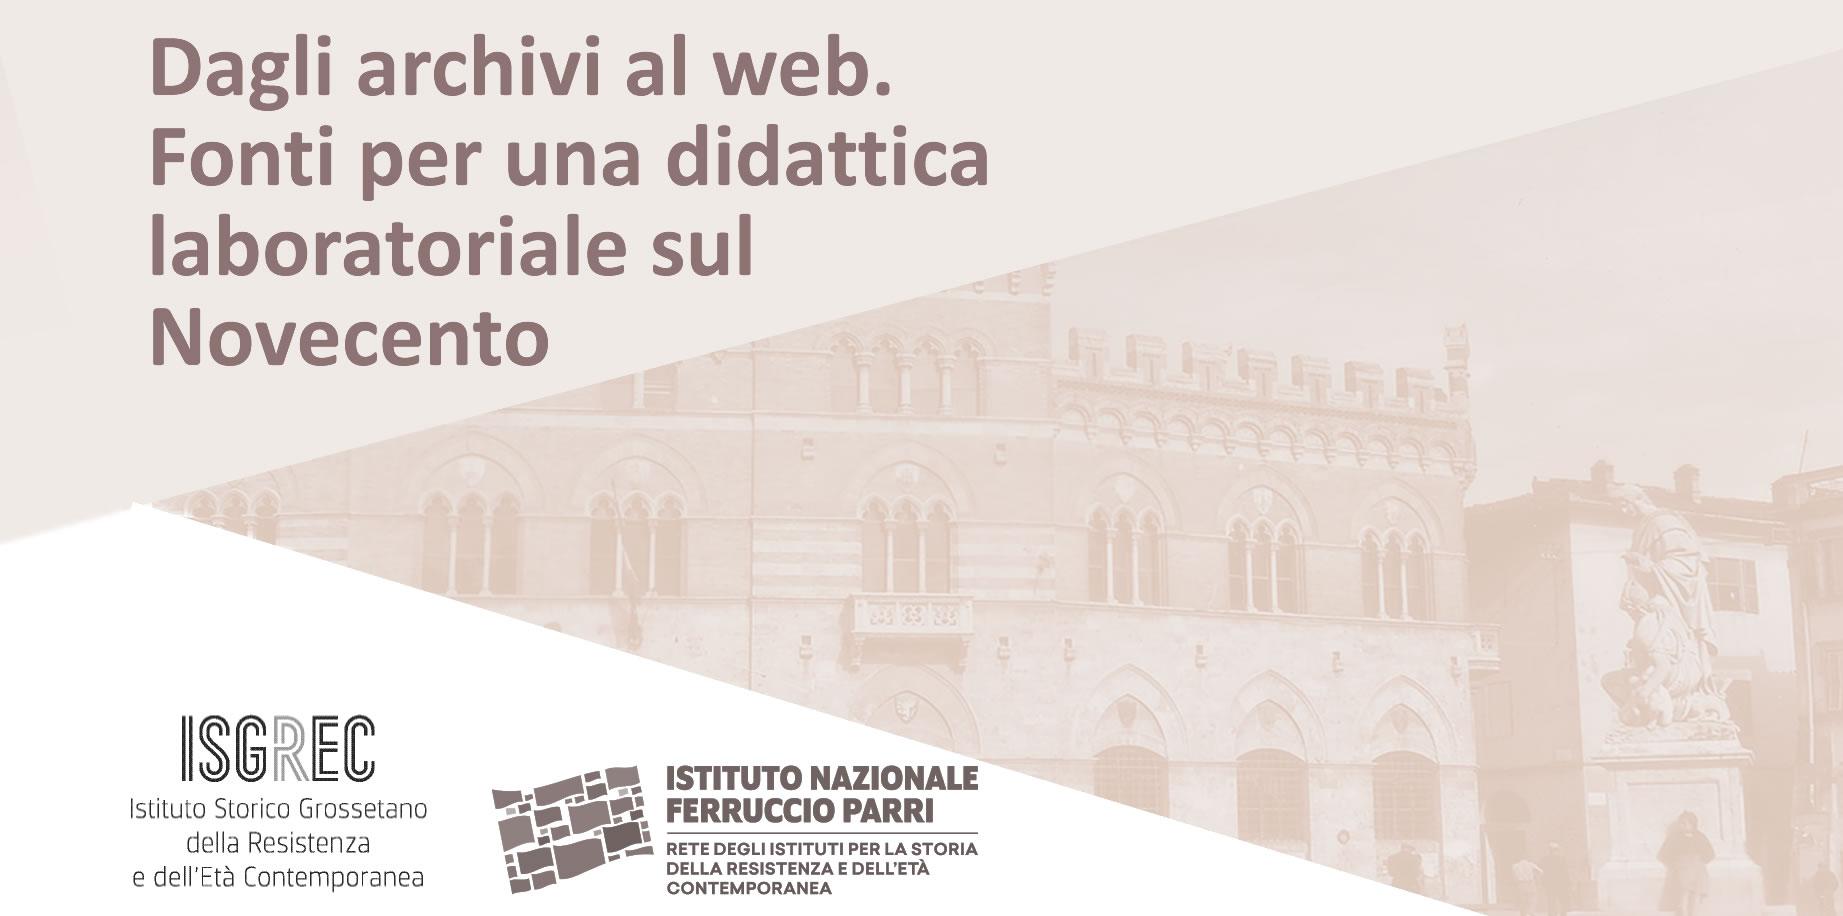 box_mailinglist_corso_archiviweb